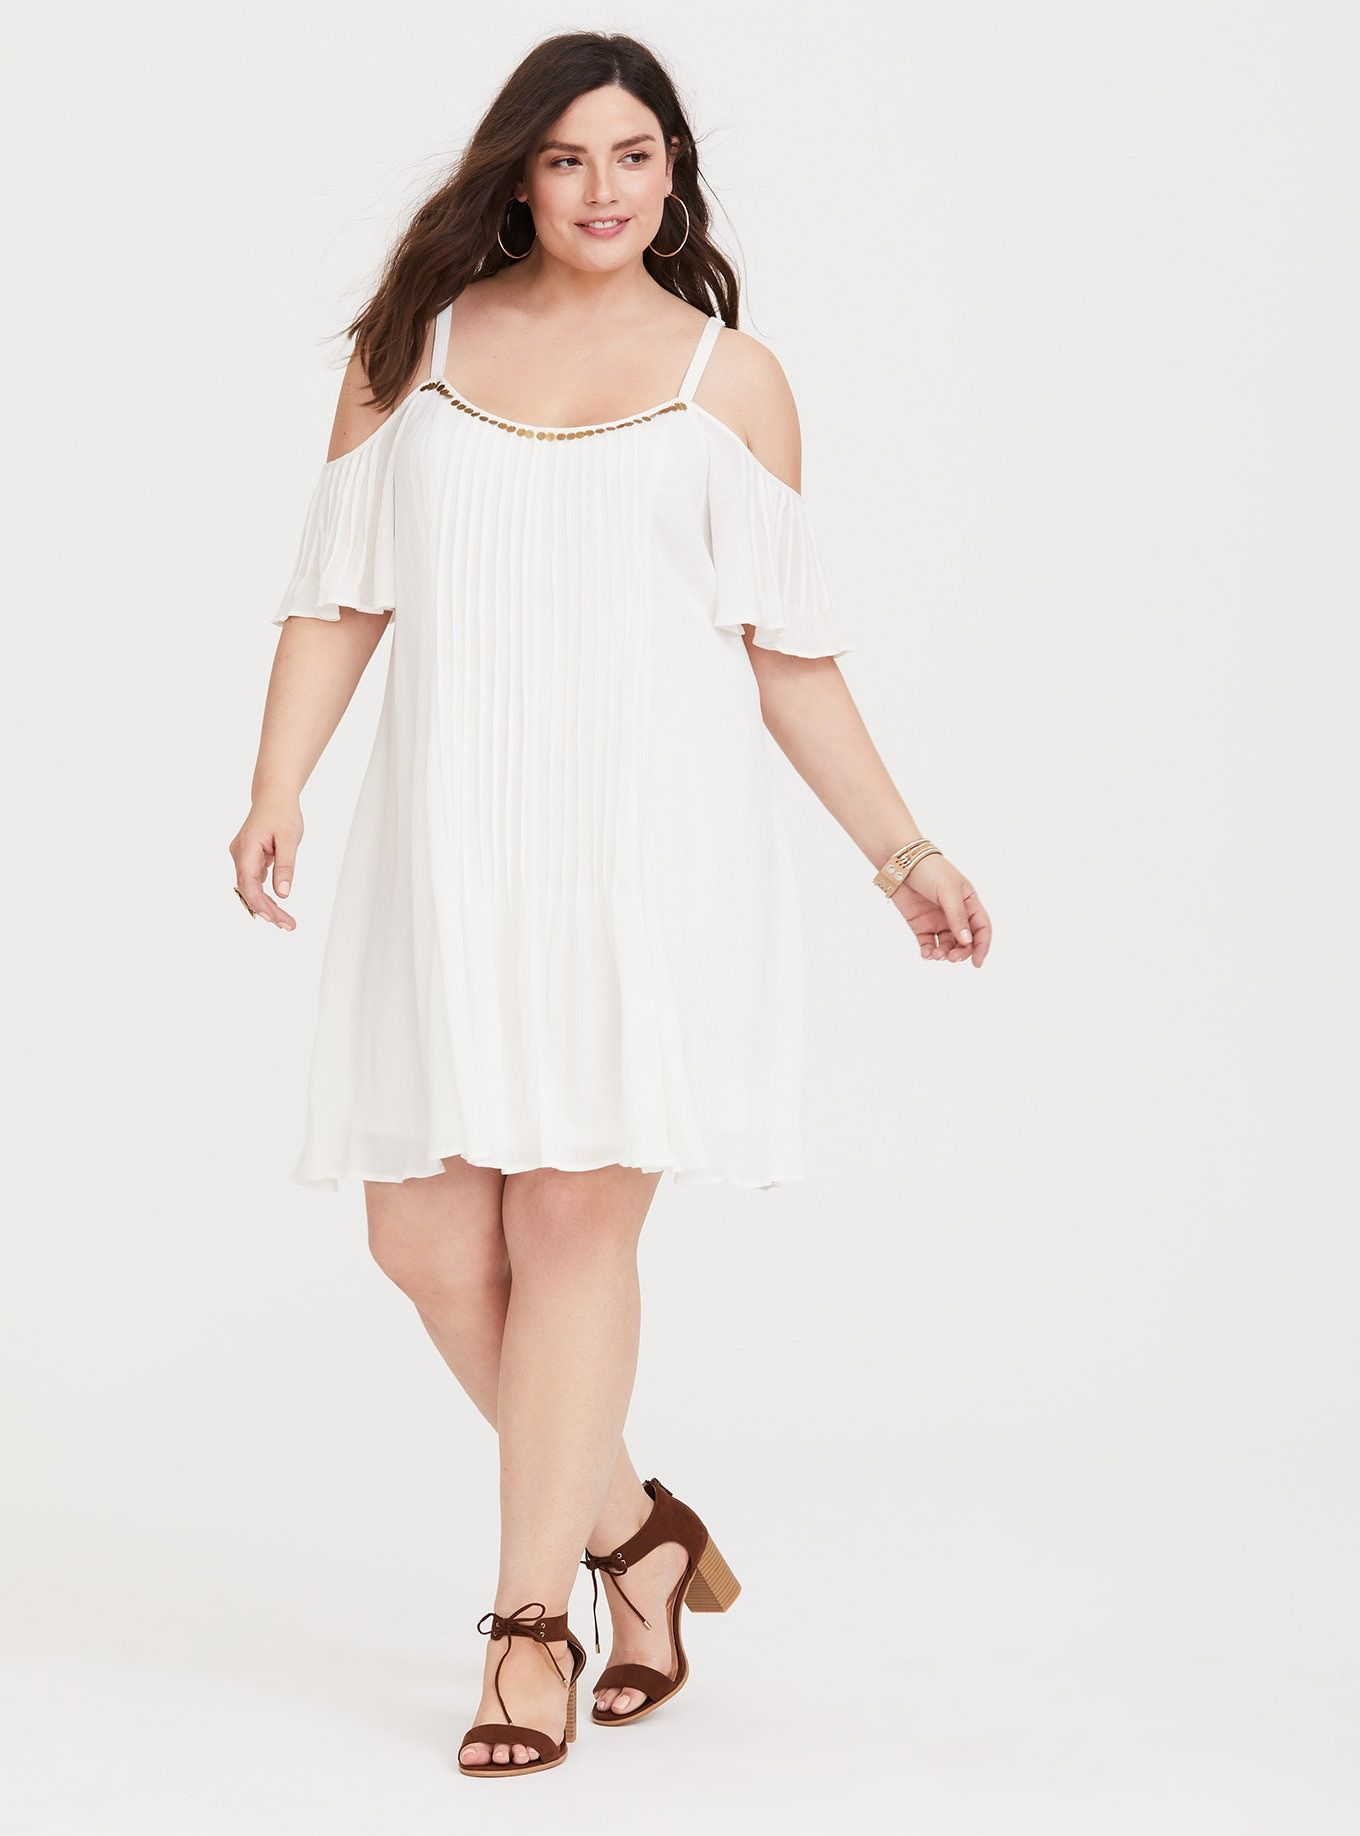 Ivory Gauze Trapeze Dress In 2020 Dresses Trapeze Dress Plus Size Fashion For Women [ 1836 x 1360 Pixel ]